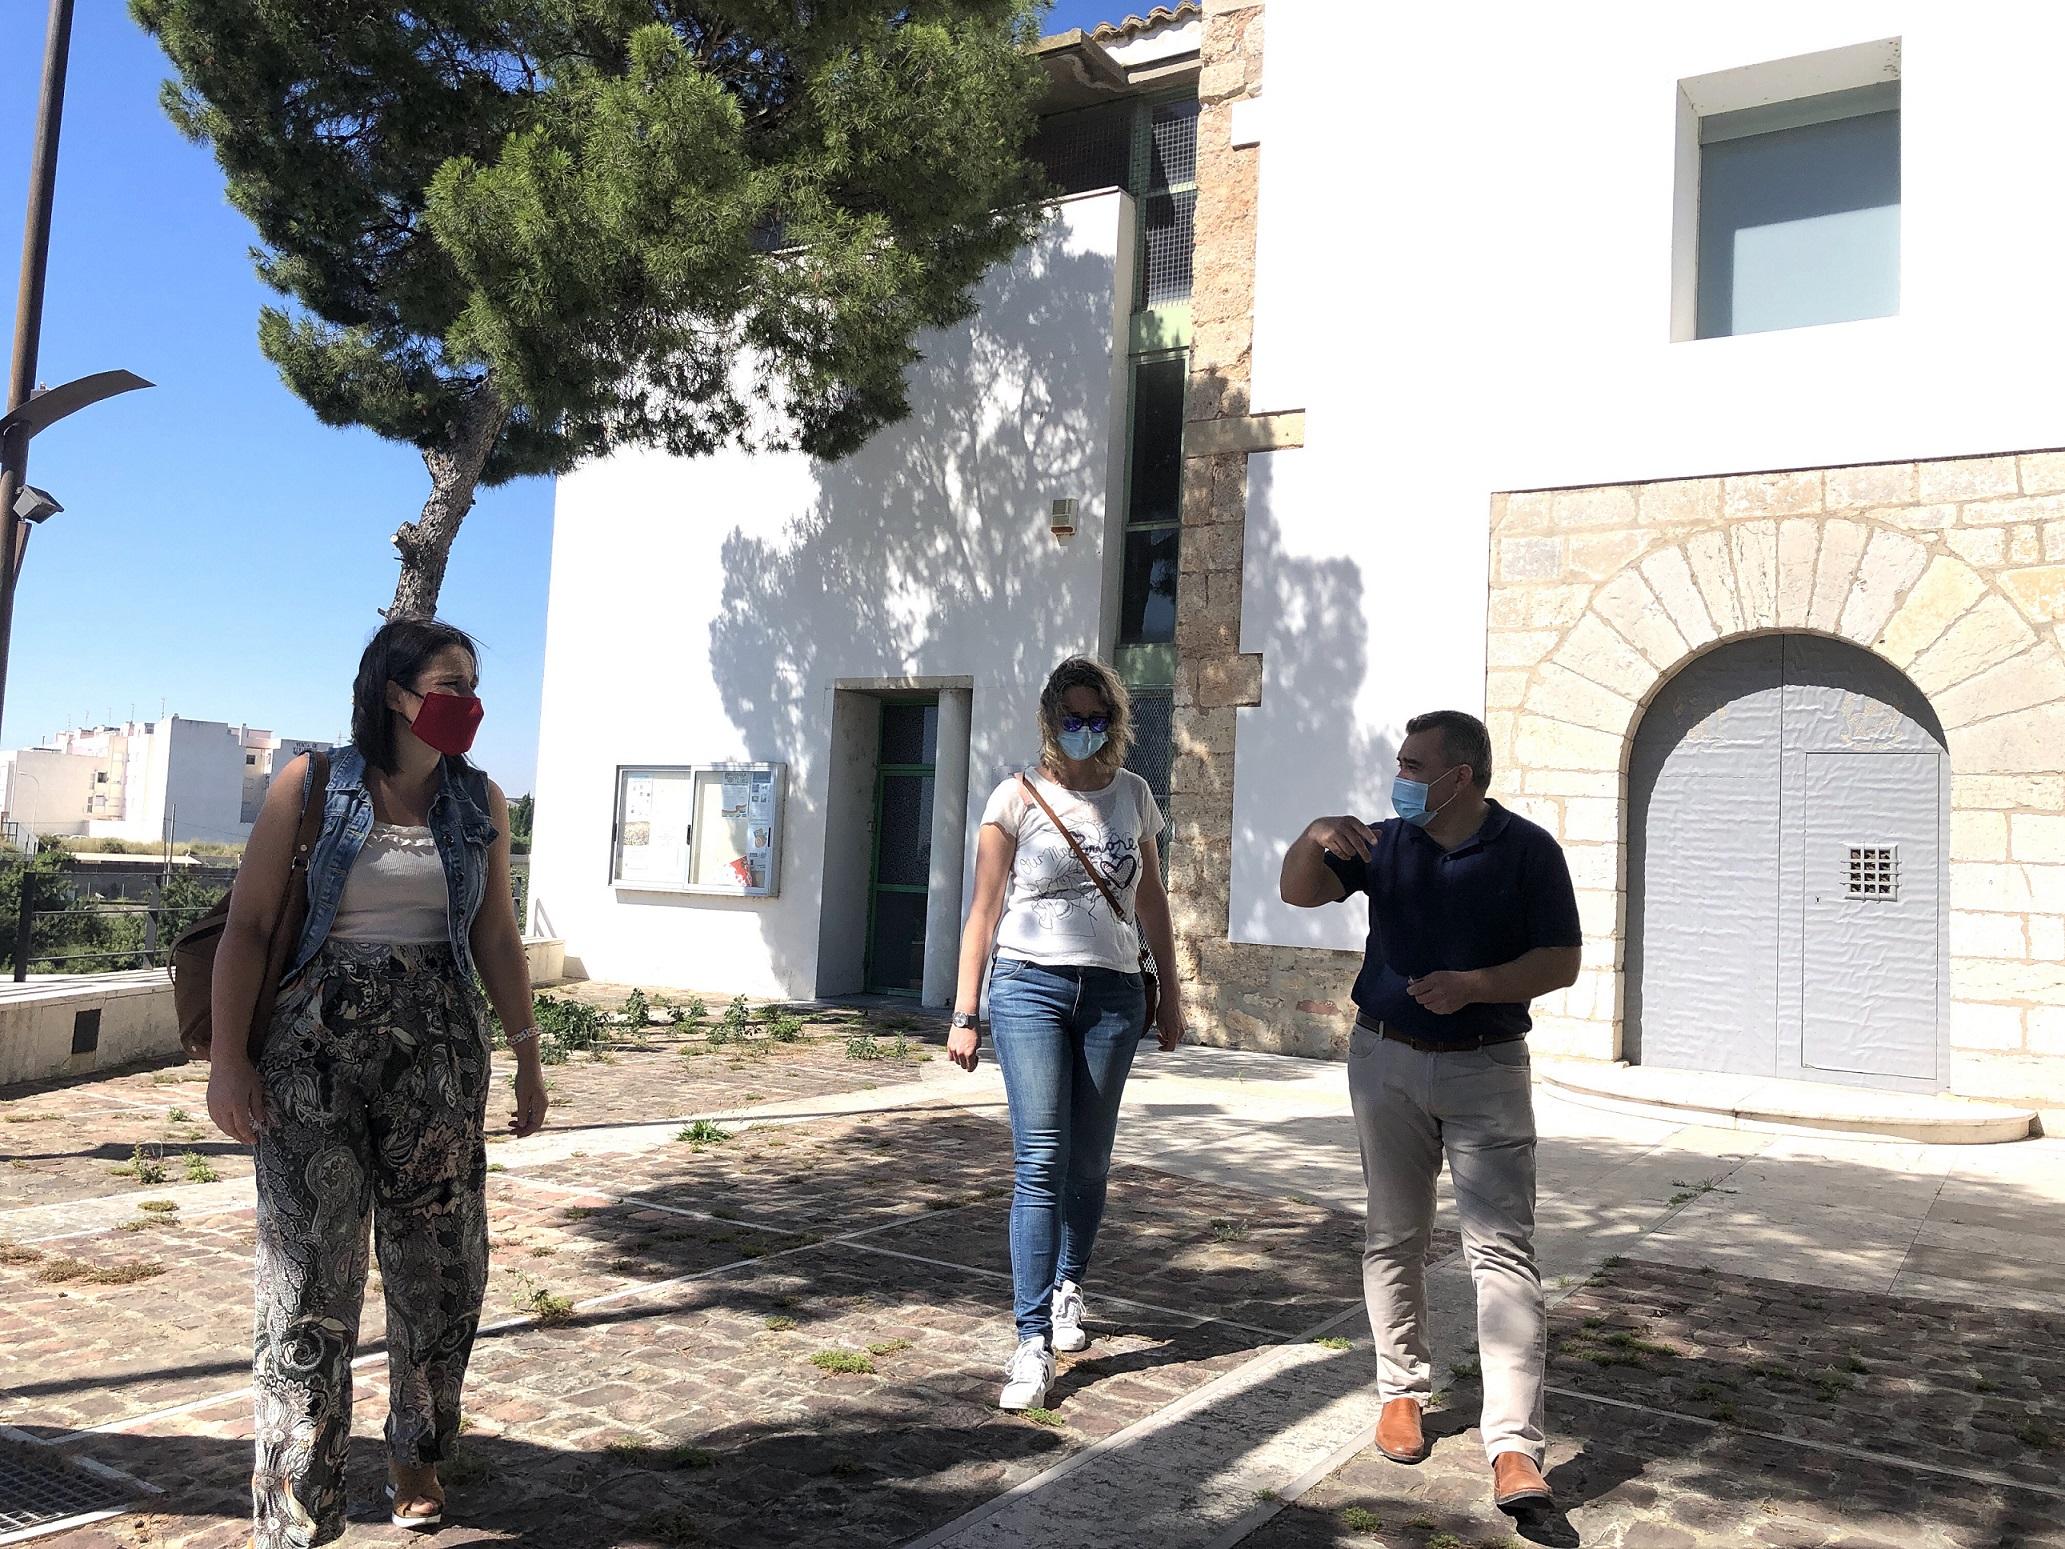 Almassora habilita el paraje de Santa Quitèria como Escola d'Estiu  para la conciliación familiar